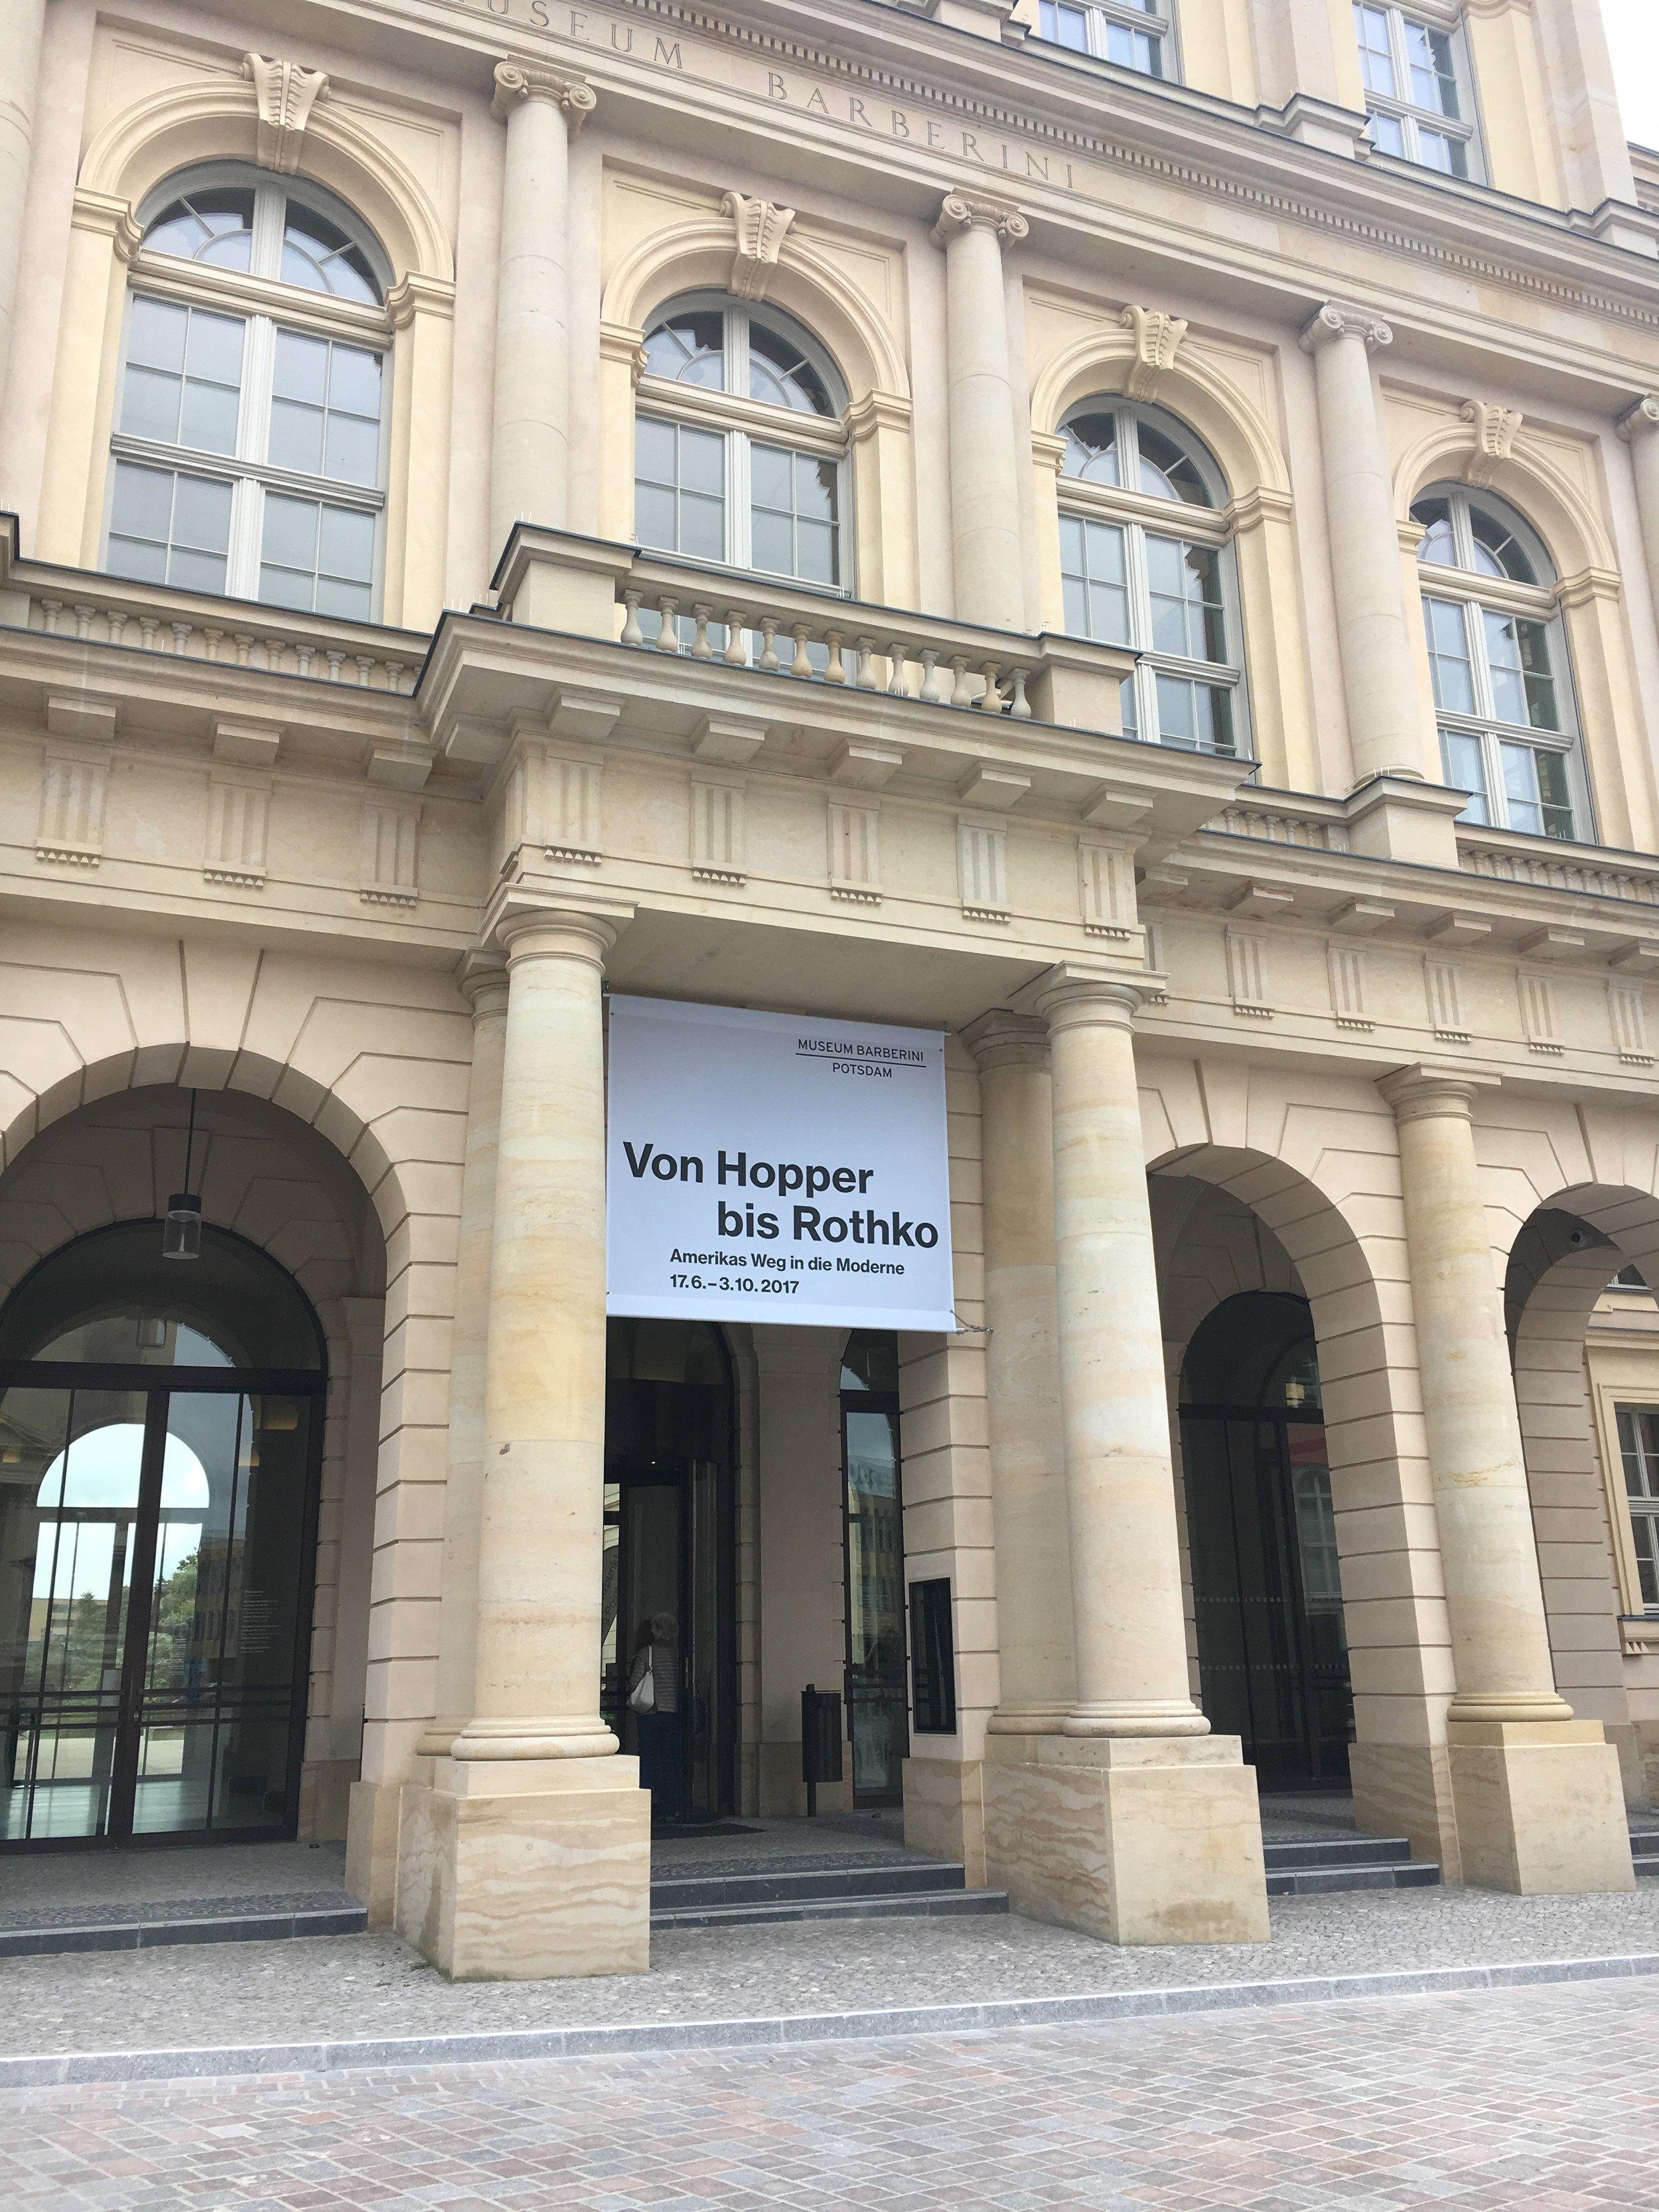 Barberini-Museum-From-Hopper-to-Rothko-1